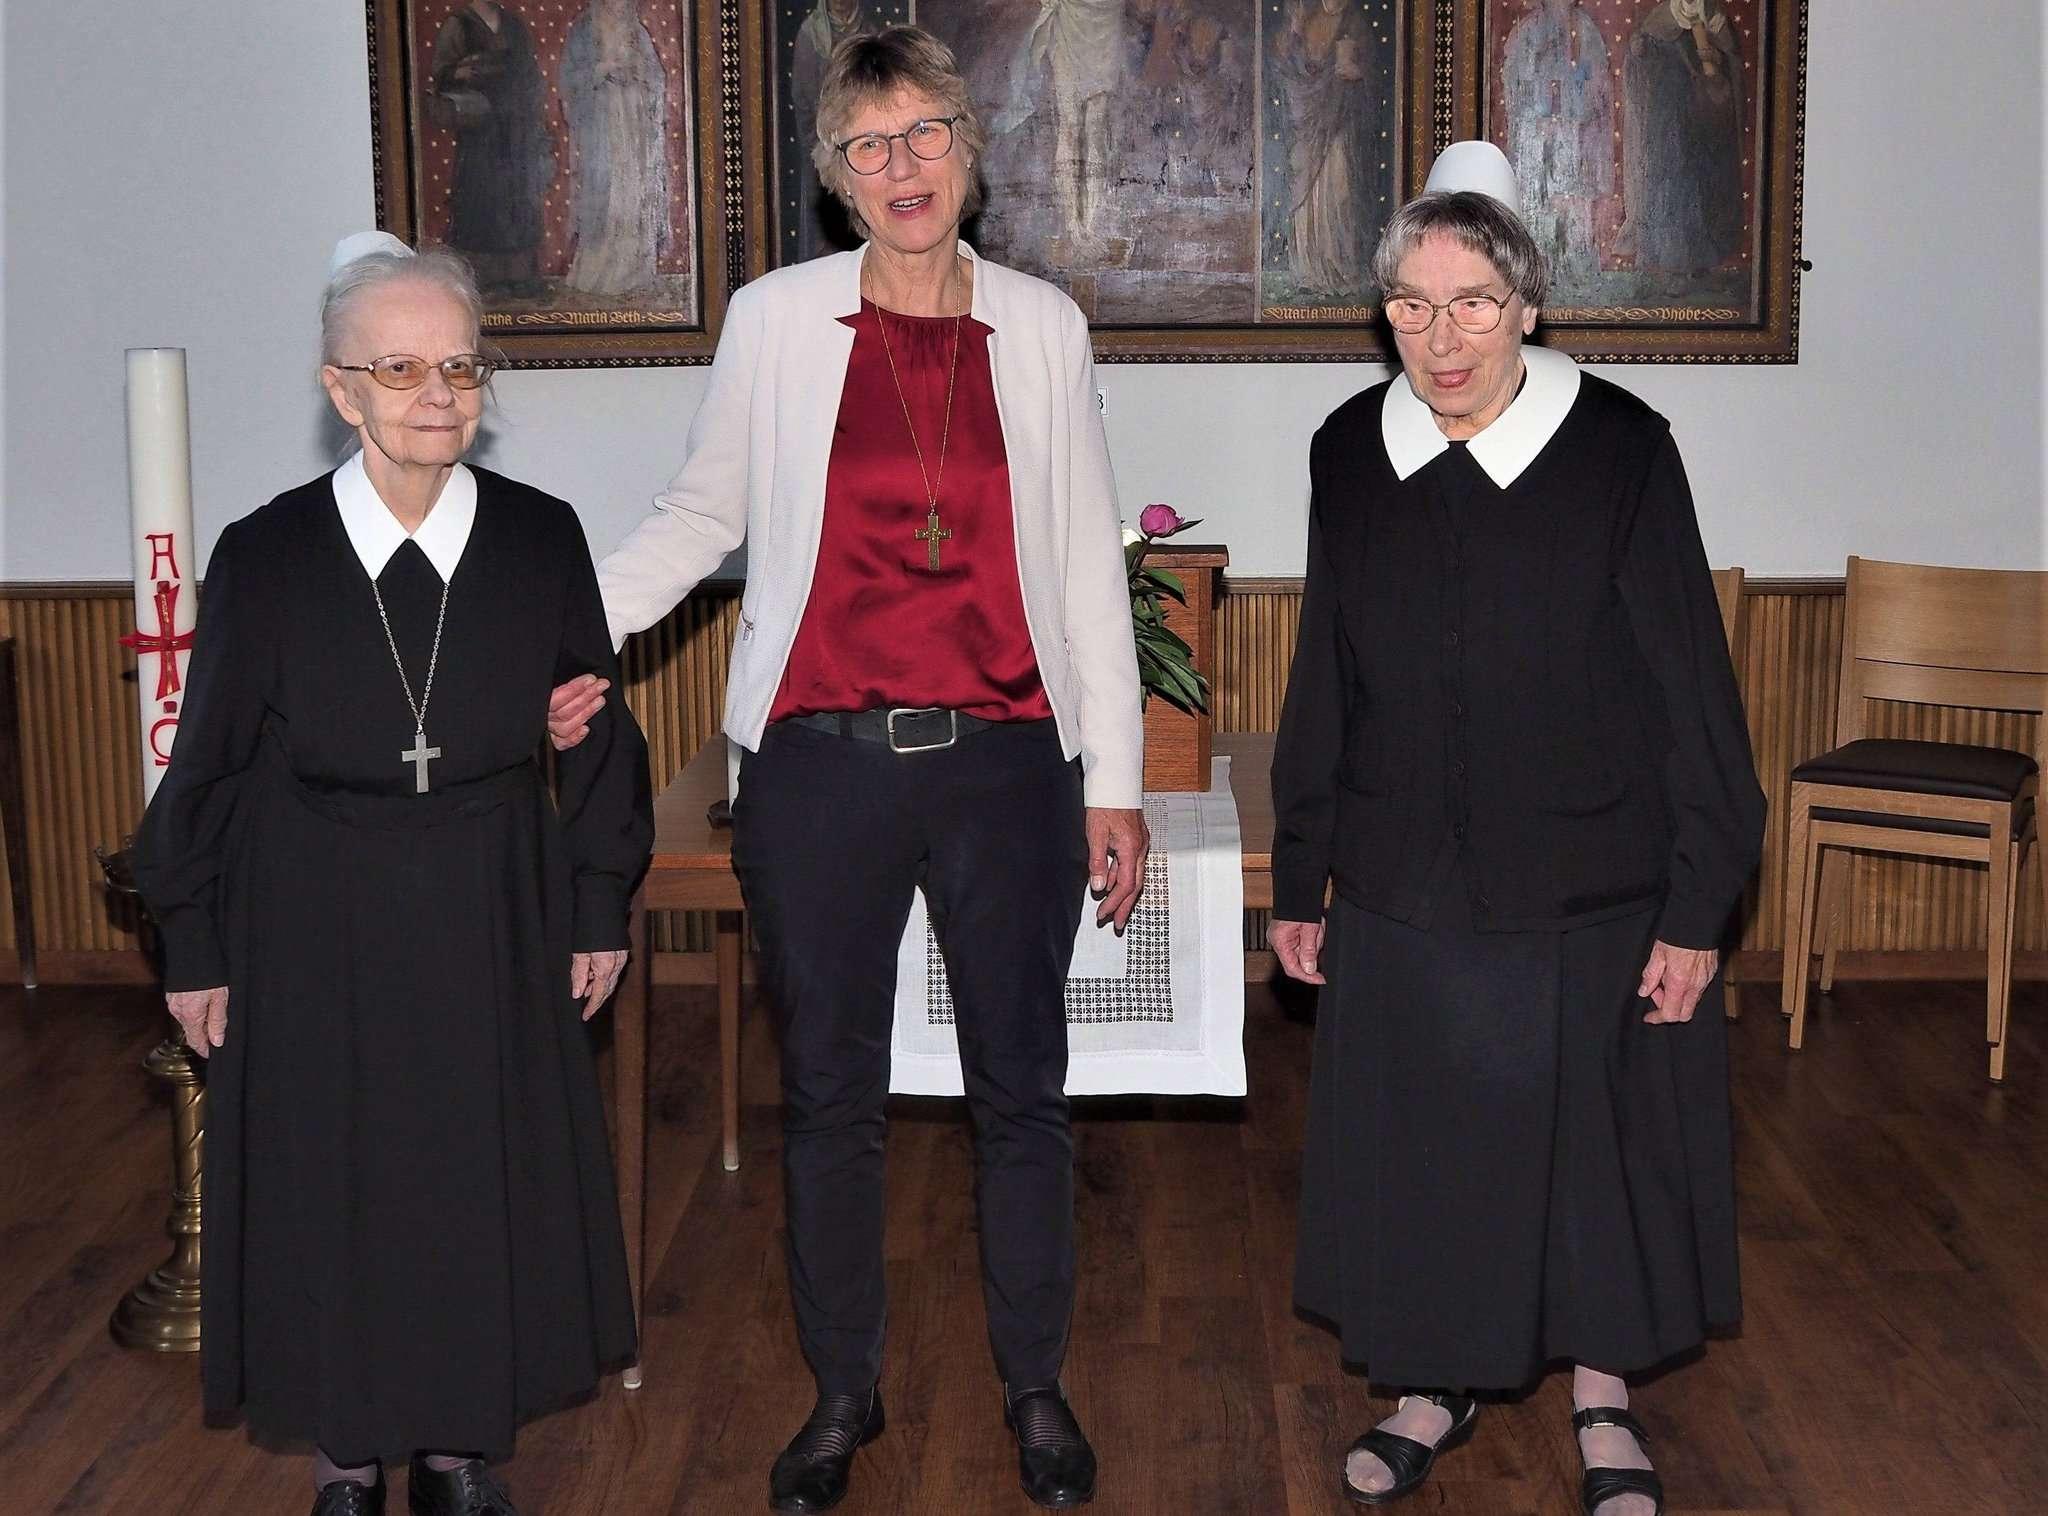 Oberin Sabine Sievers (Mitte) gratuliert Ingrid Prigge (links) und Margrit Merker. Foto: Klaus Brünjes